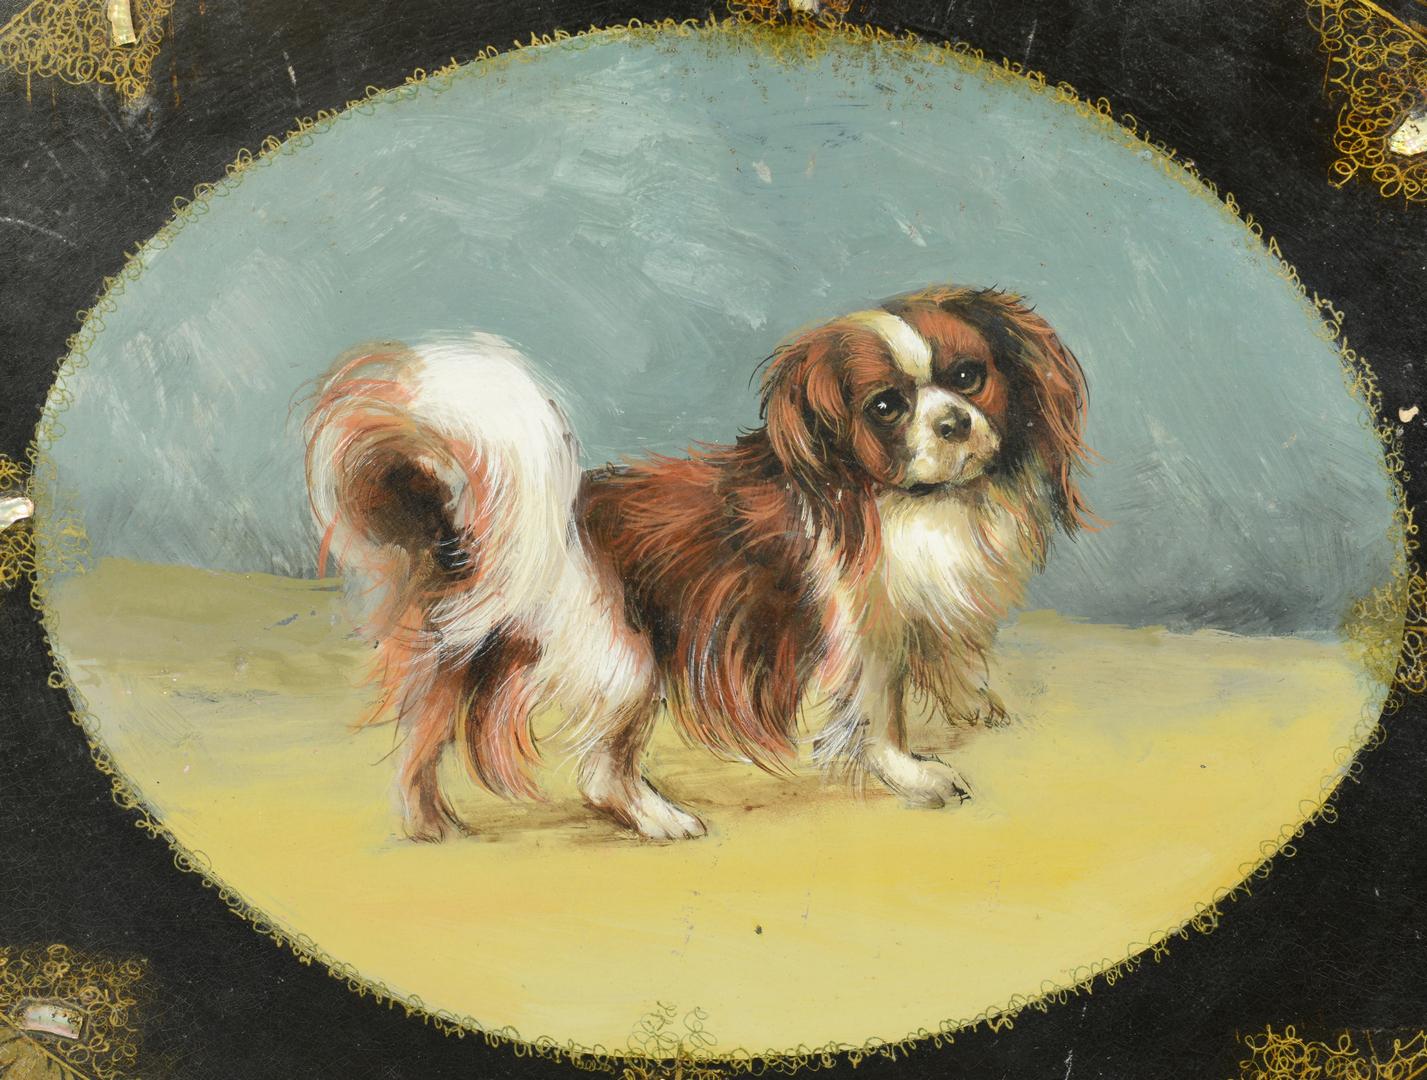 Lot 3088124: Papier Mache Tray, Pekinese Dog